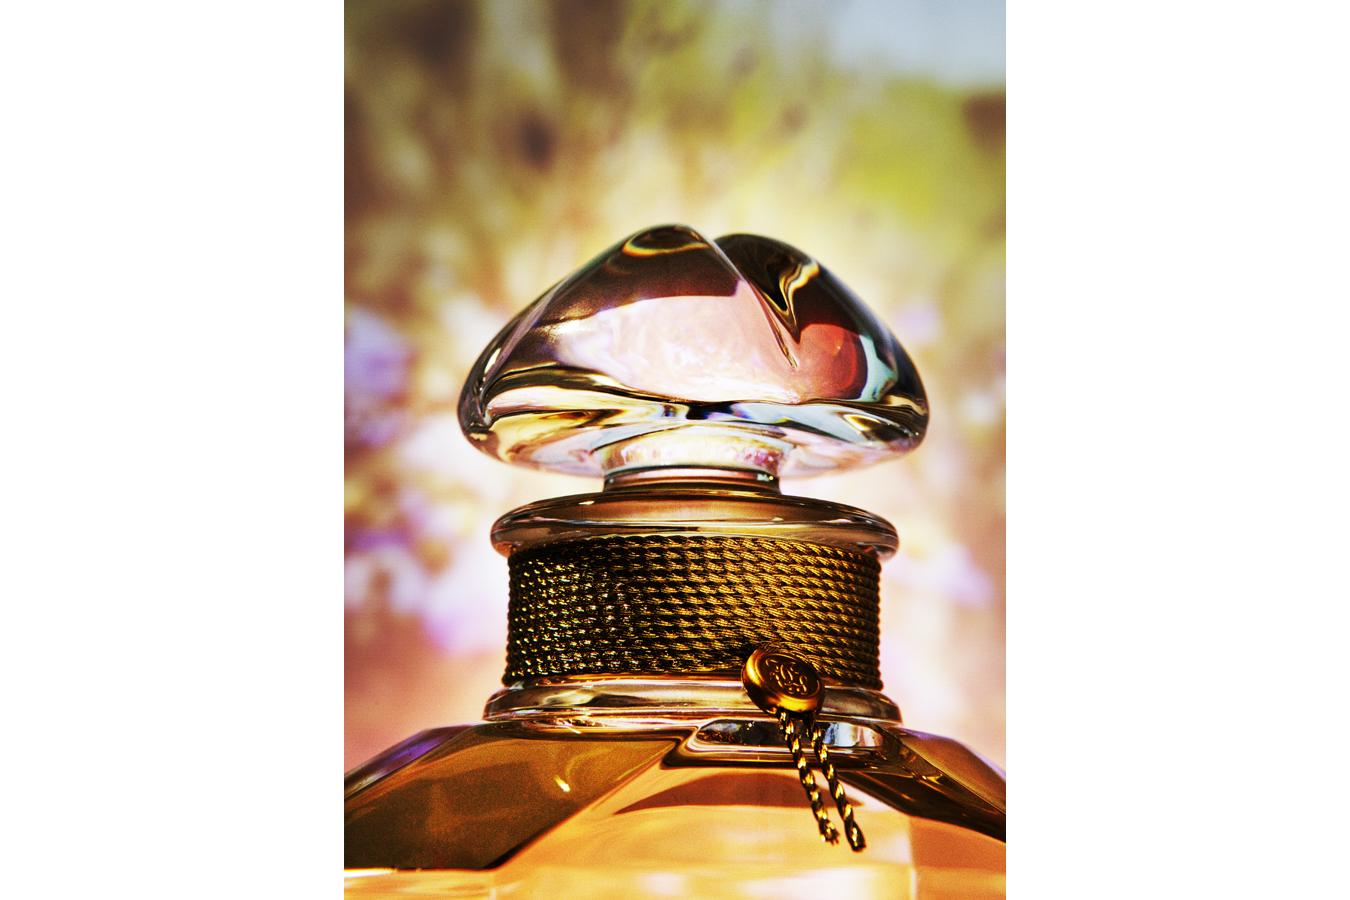 LuxGuerlain4seasons30840NWeb.jpg